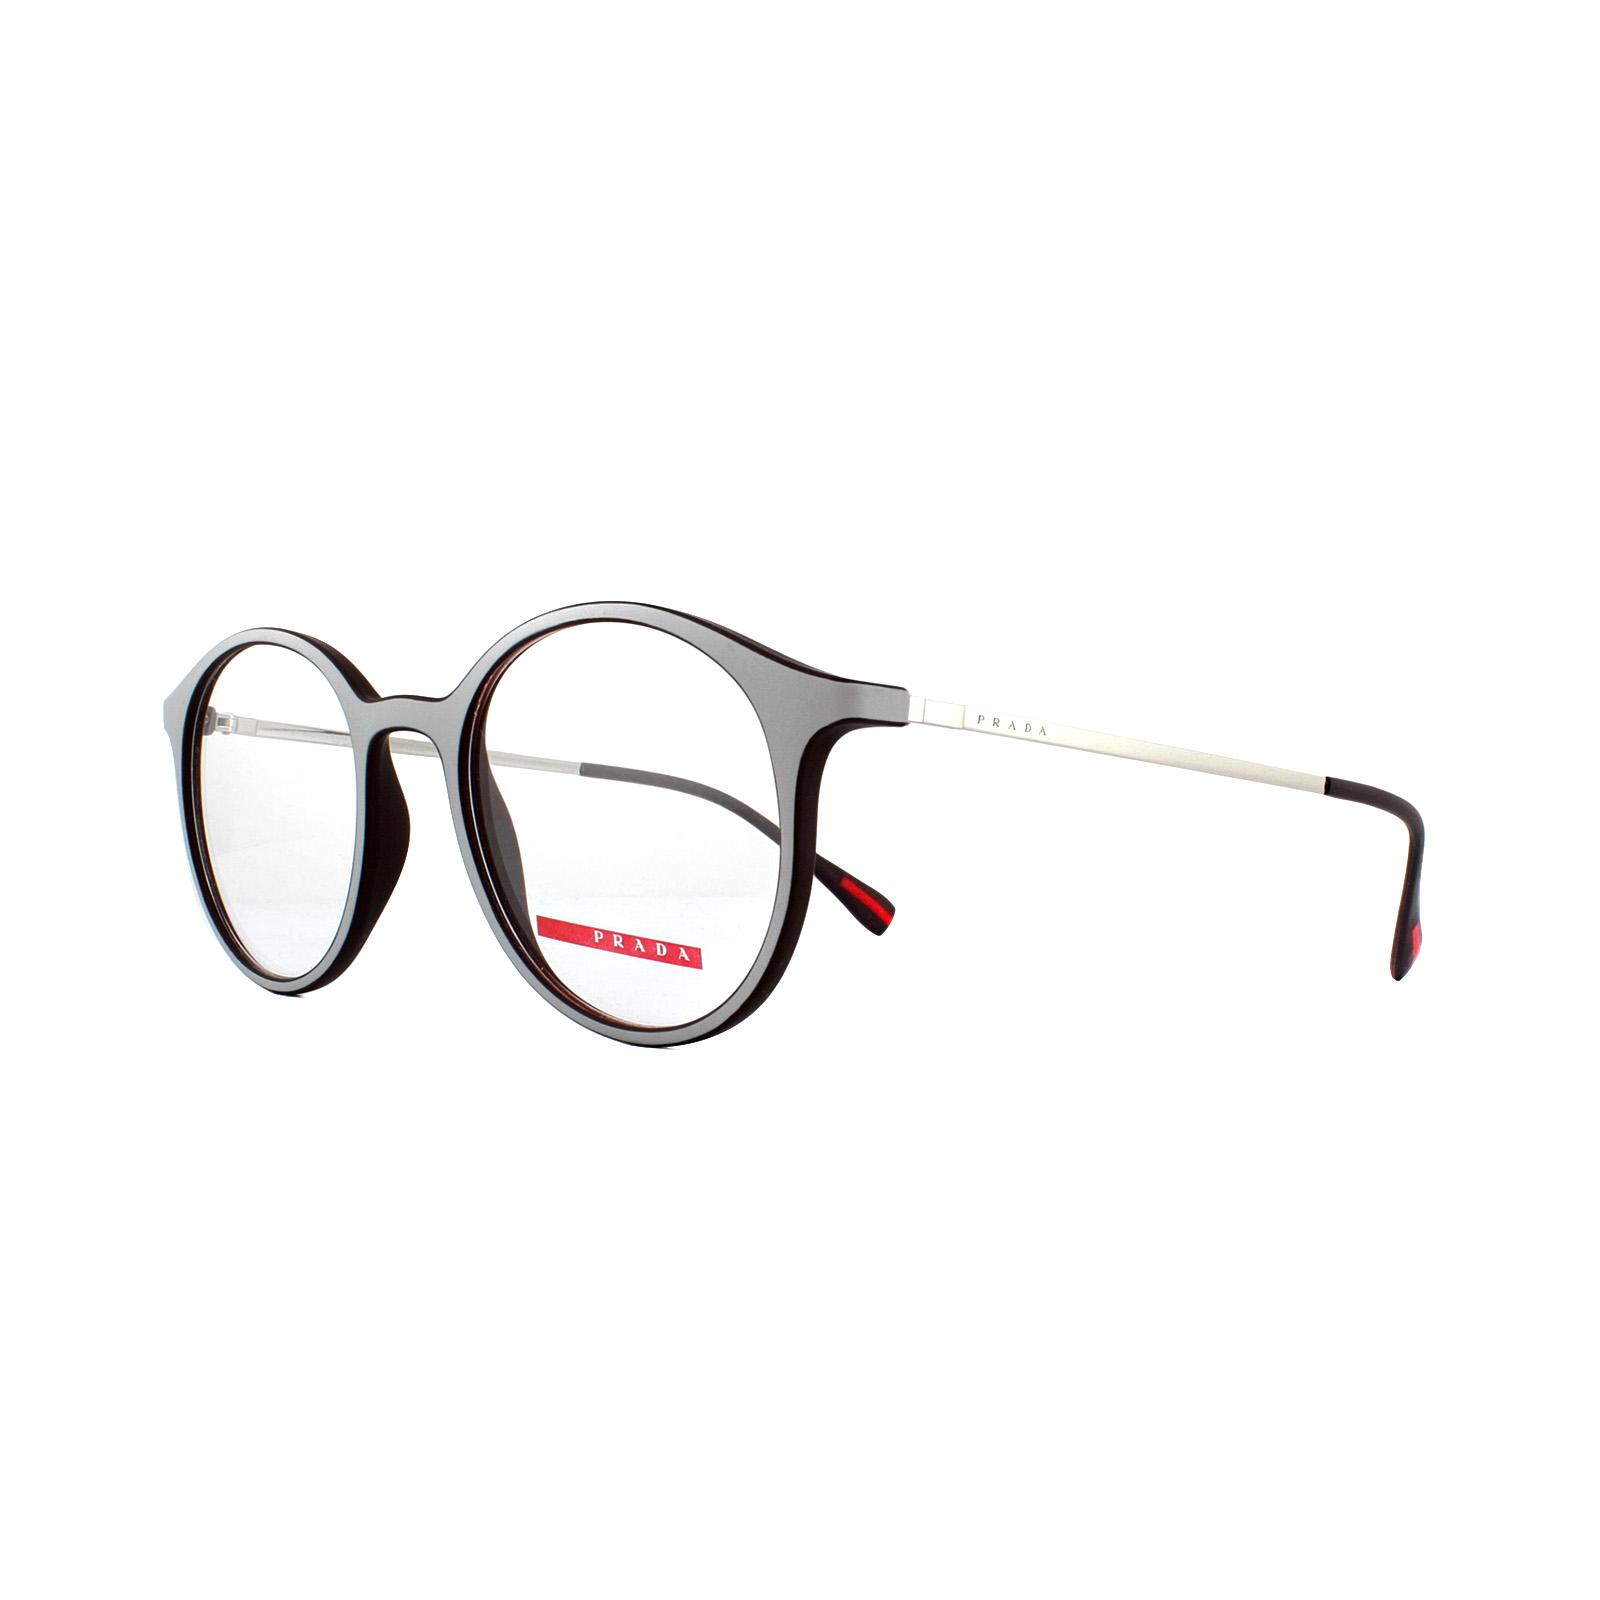 12a22acc3e68 Sentinel Prada Sport Glasses Frames PS 02IV VY01O1 Top Grey Brown Rubber  49mm Mens